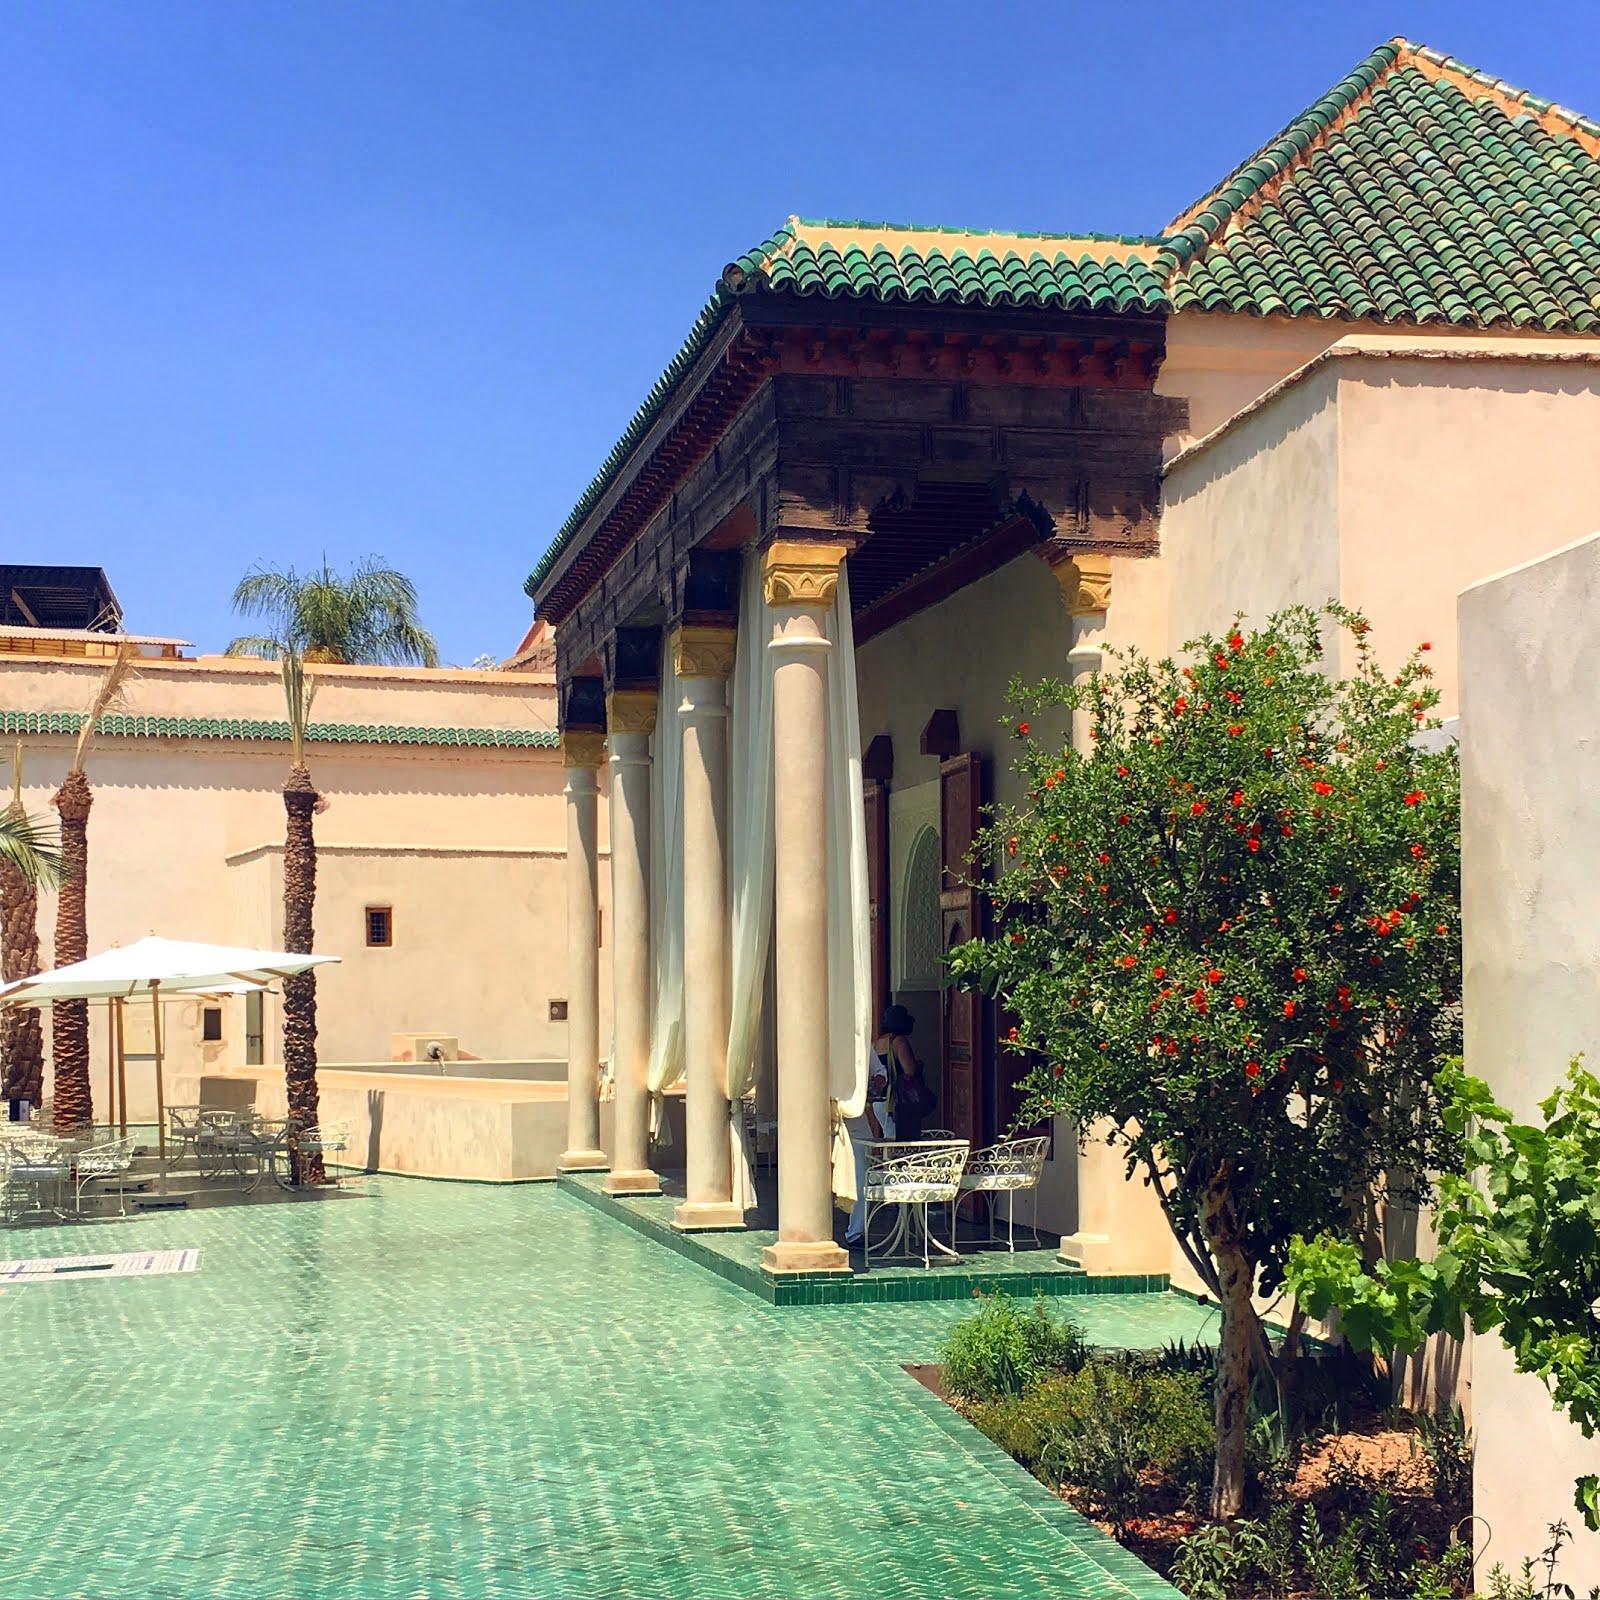 Marrakech shopping tour for hot days for Le jardin secret livre